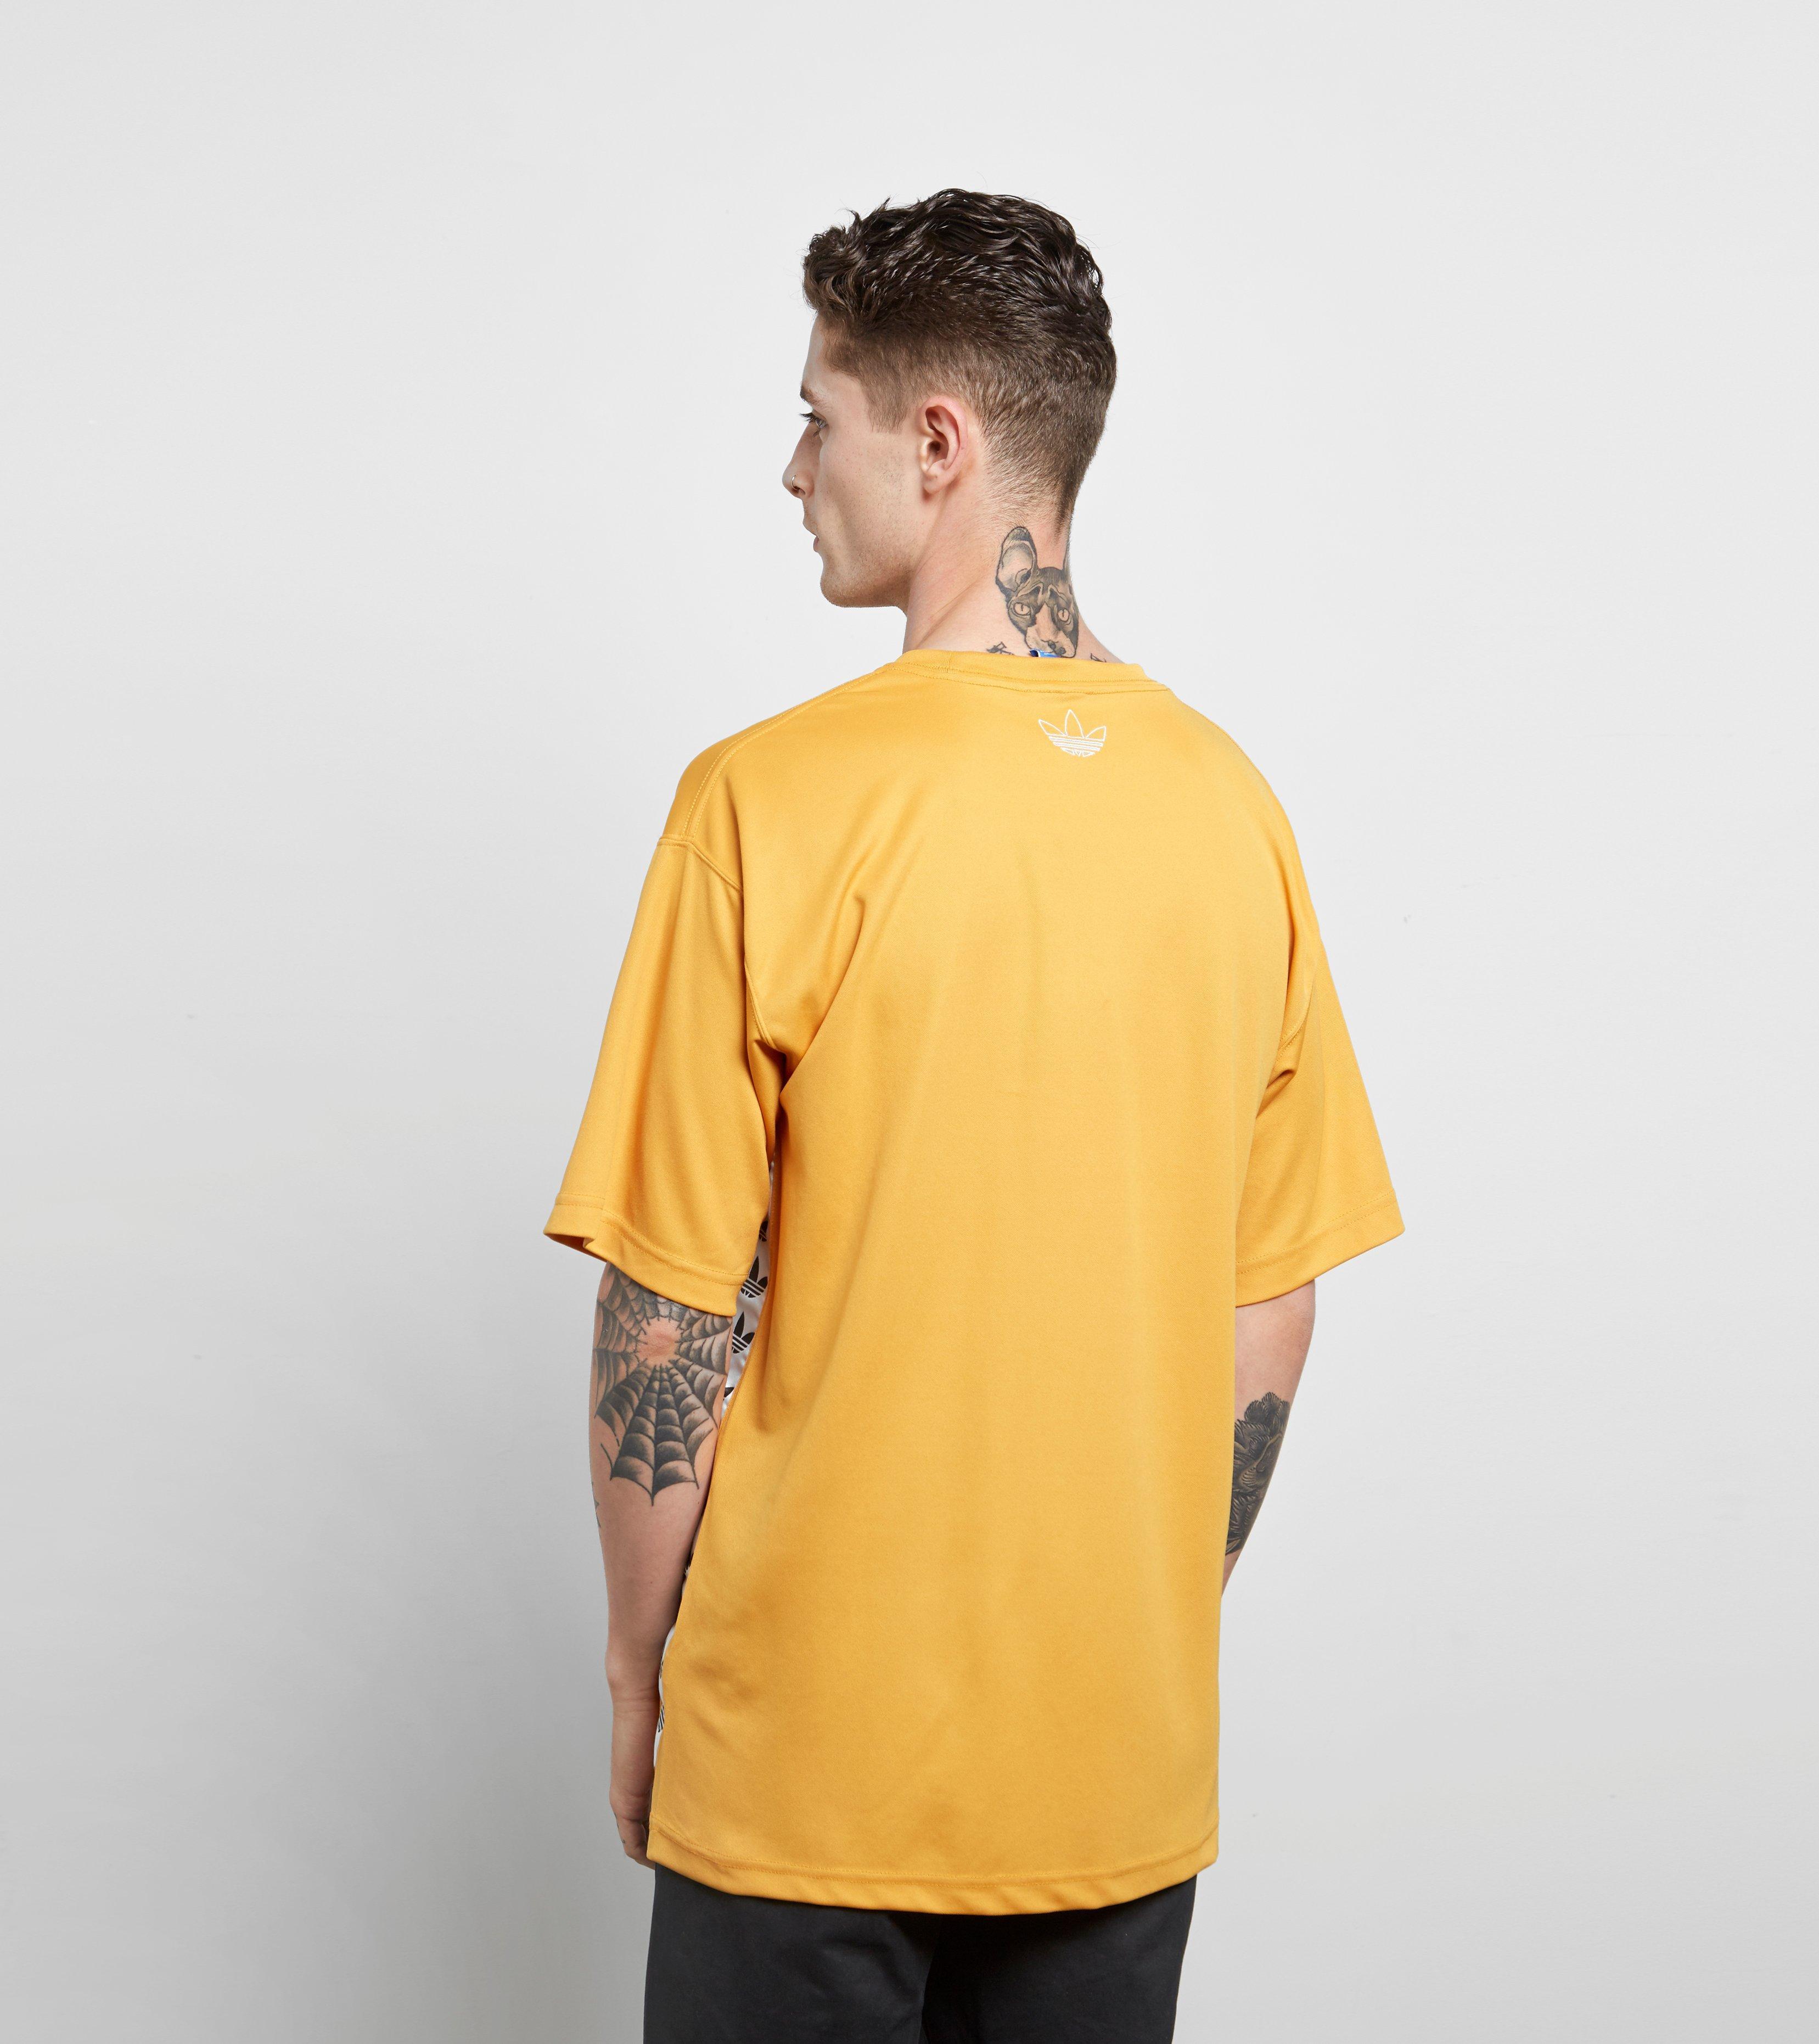 adidas originals tape t shirt yellow